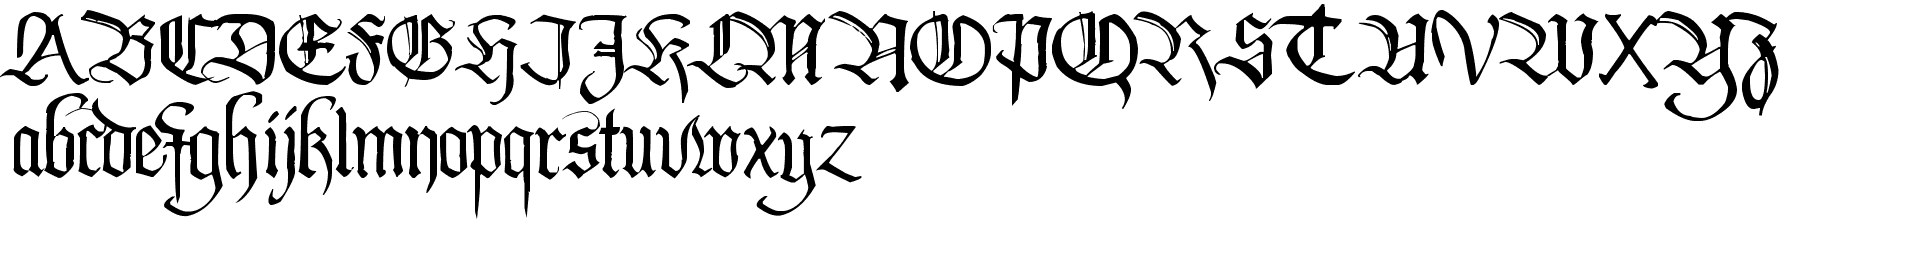 PentaGram's Callygraphy